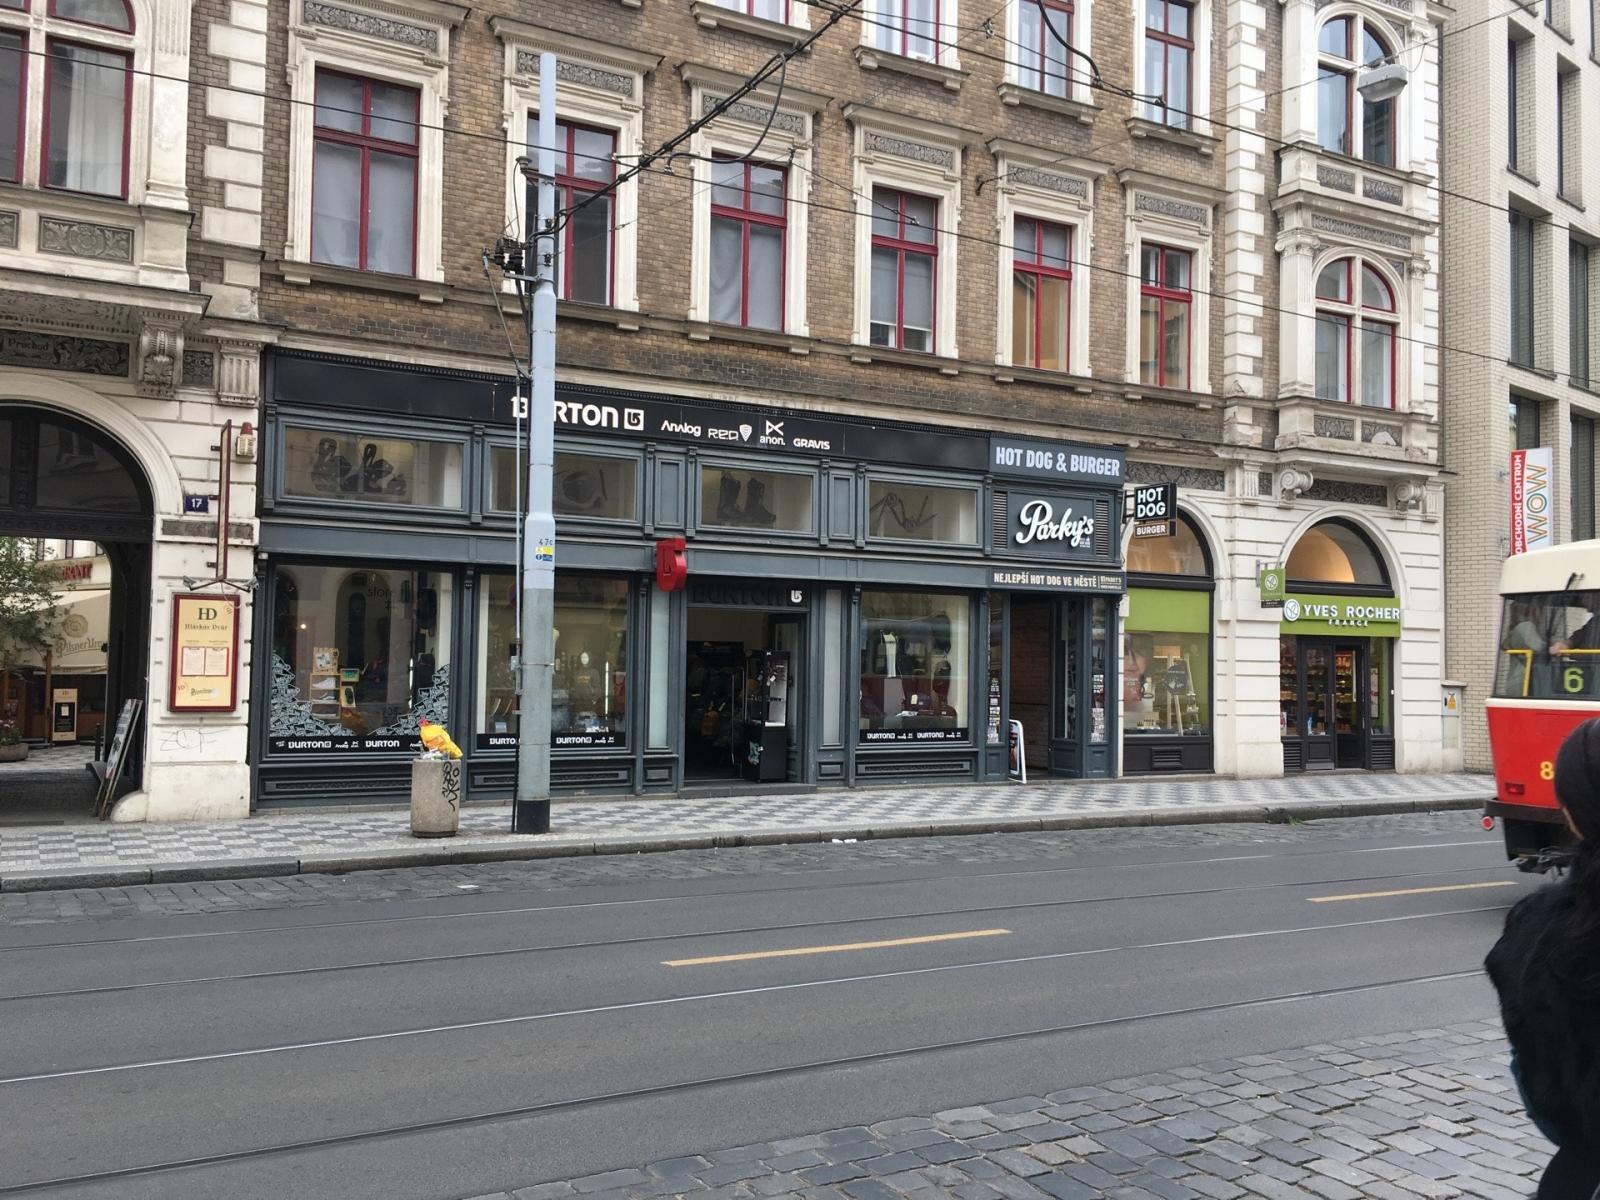 Obchod Store 13